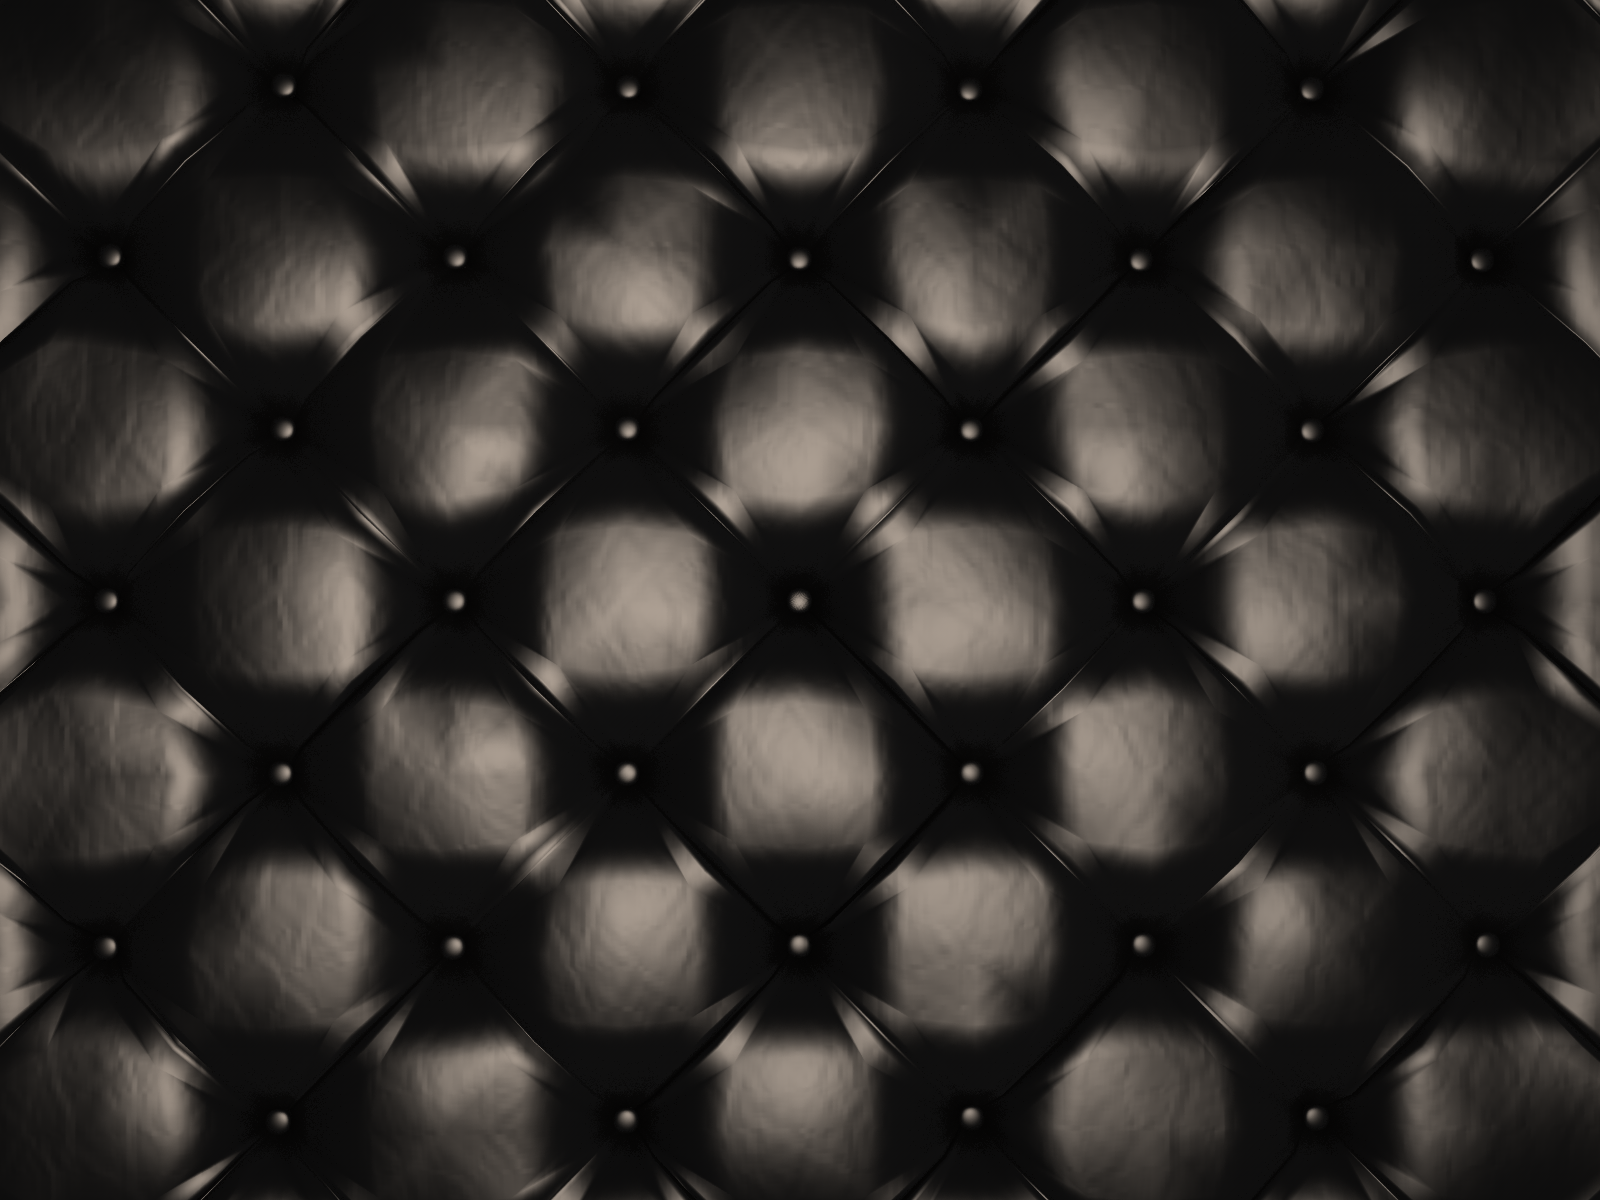 Black Leather Background By Master Jags On Deviantart